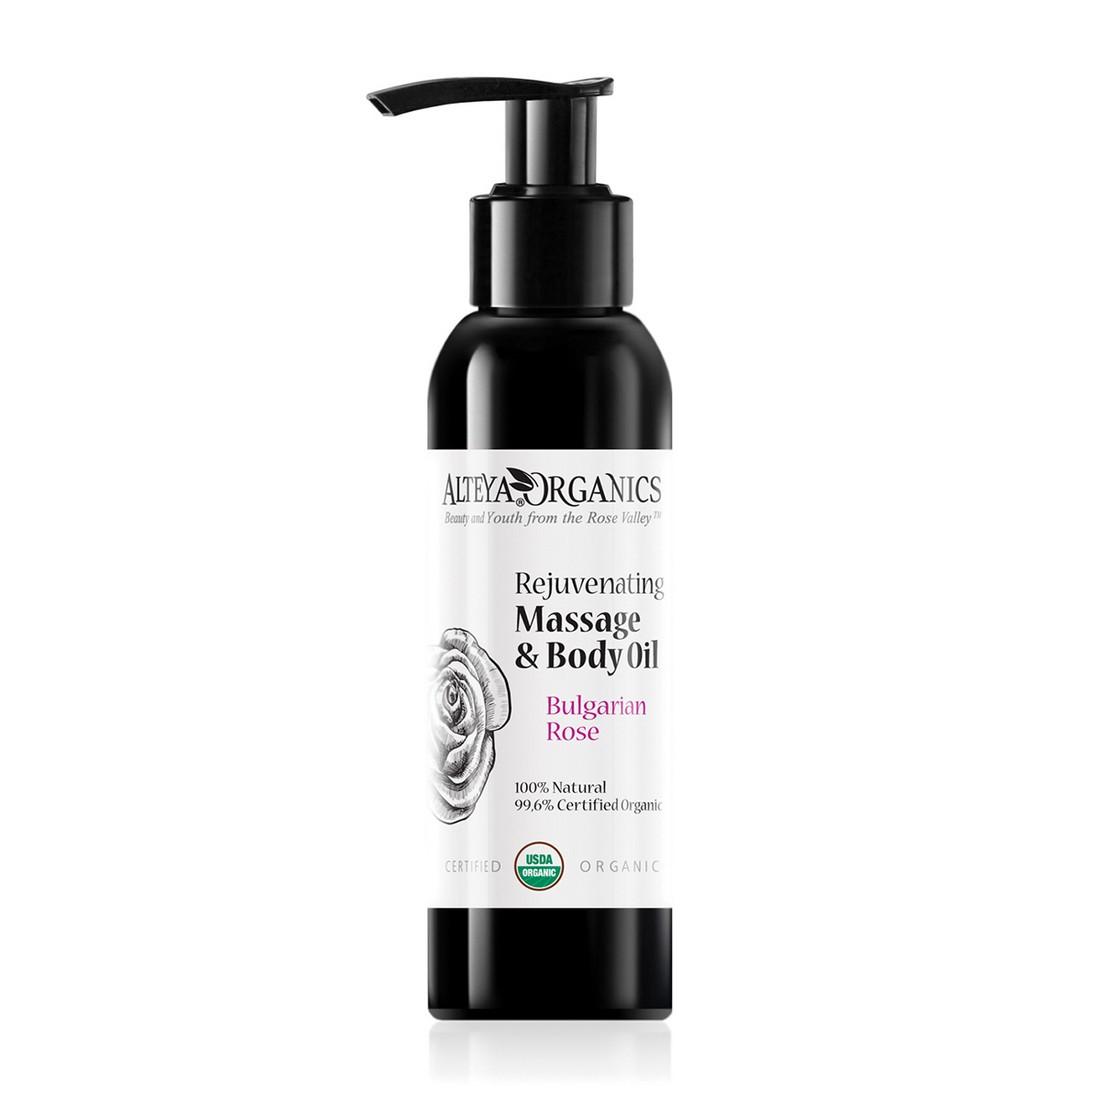 Bio organic body massage oil with Bulgarian rose oil Alteya Organics